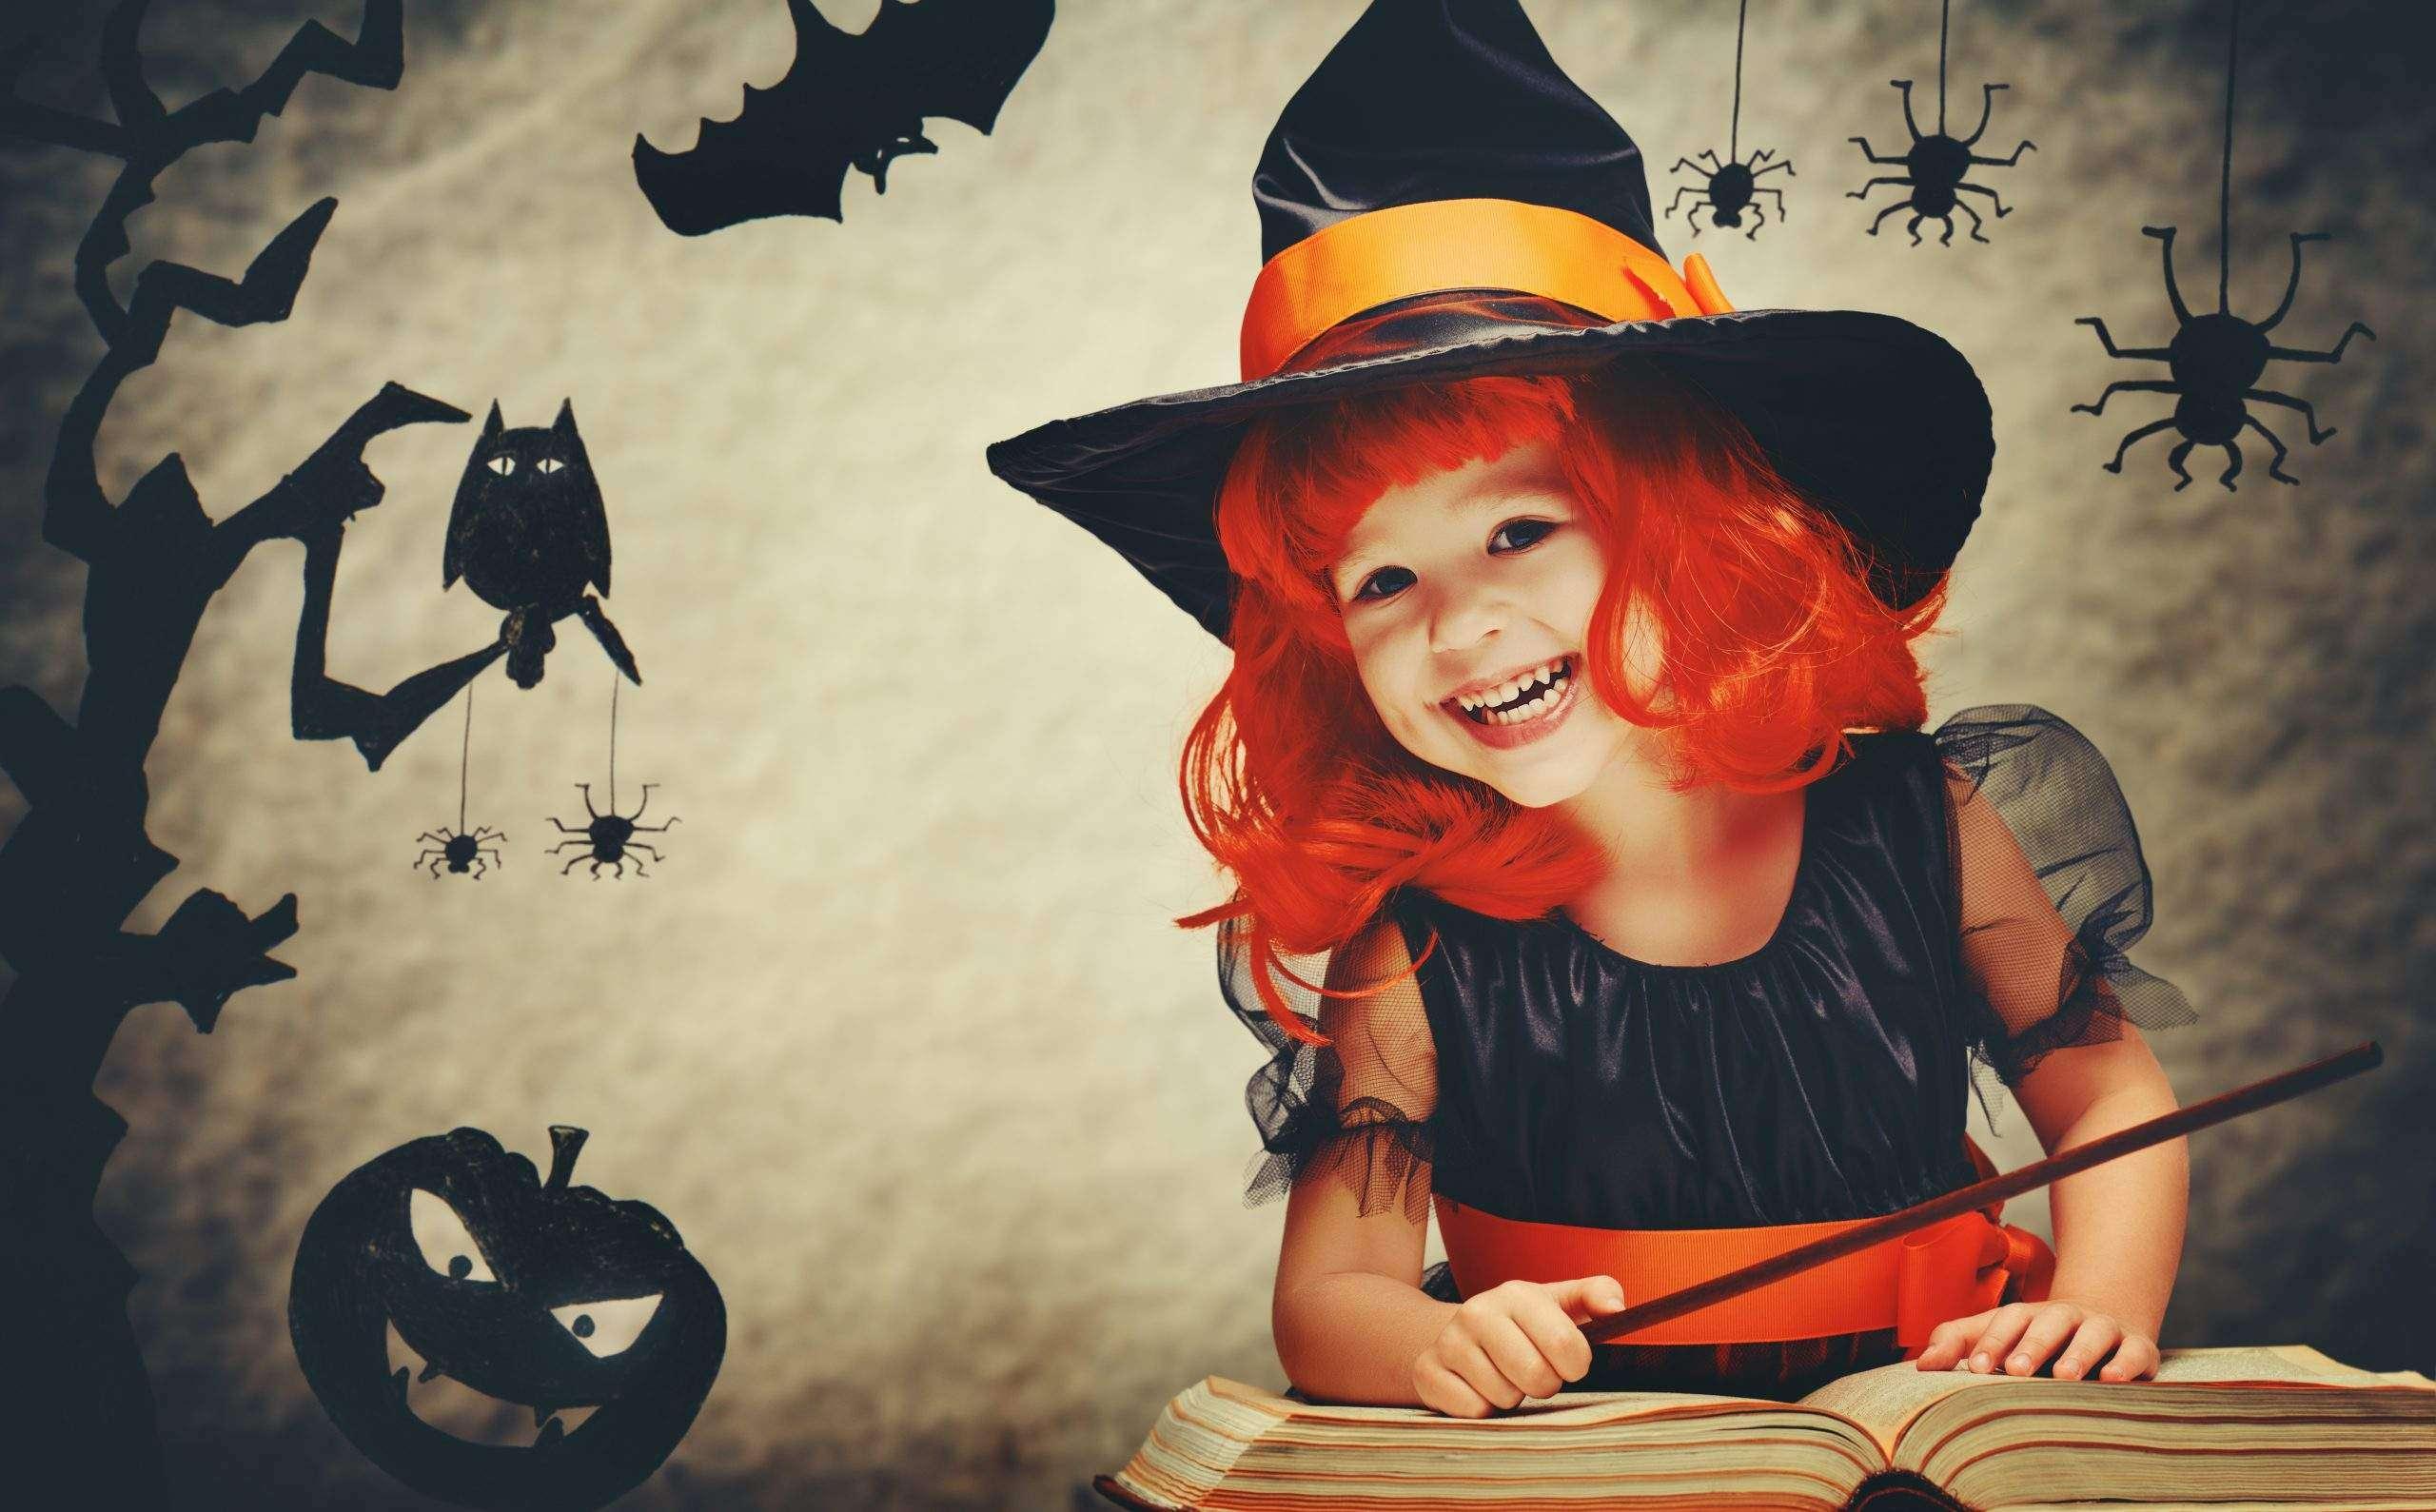 Trang-diem-Halloween-cho-be-an-tuong